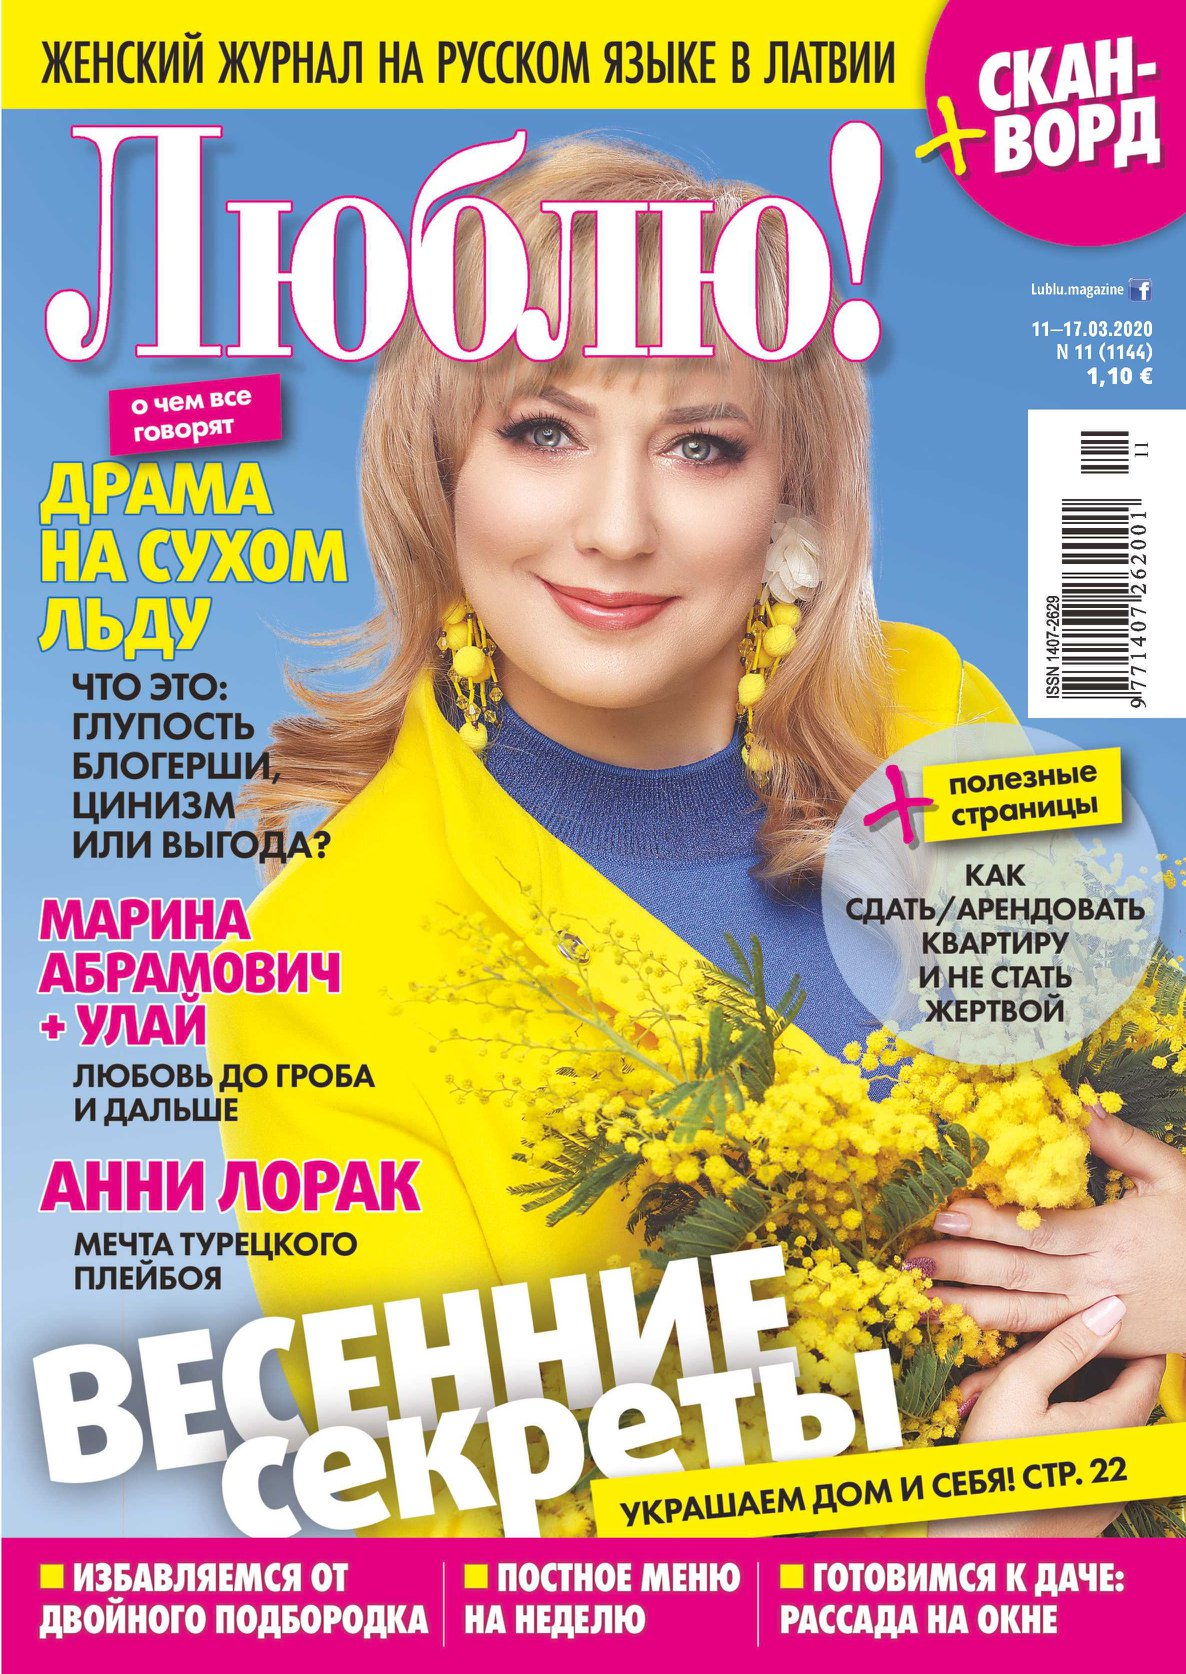 200219 - Anastasija